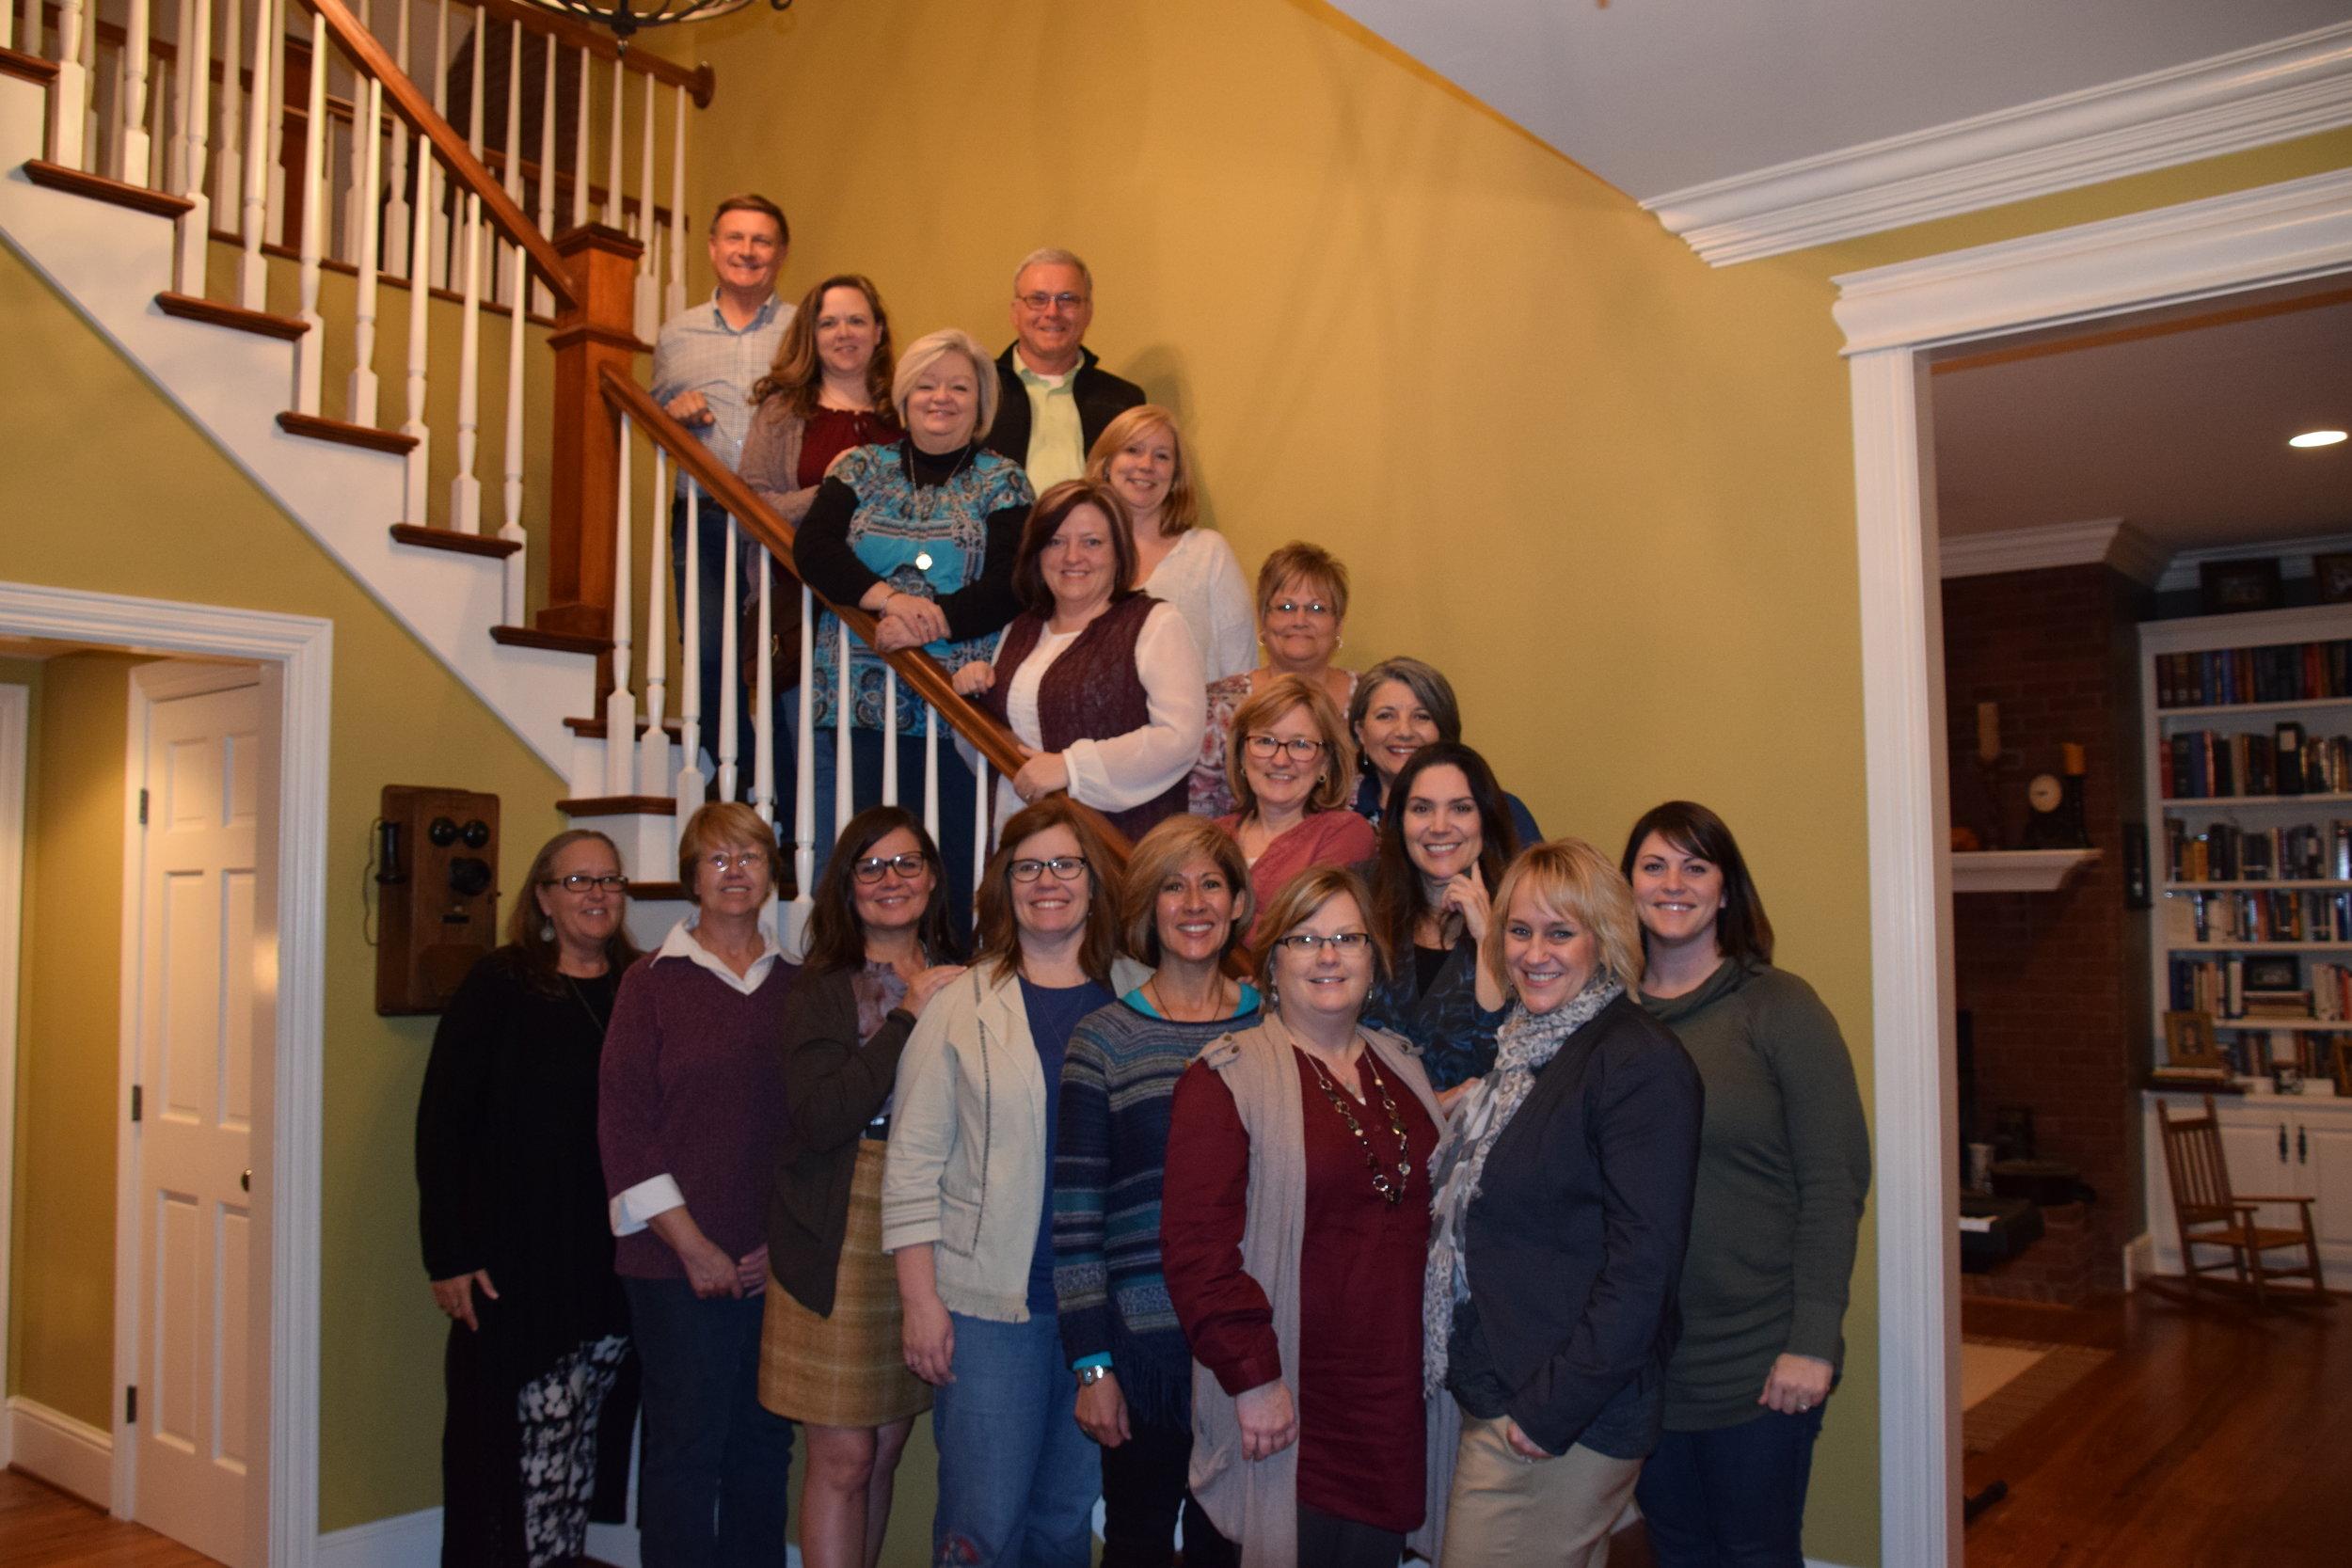 - The Deeper Still Upper Cumberland Team